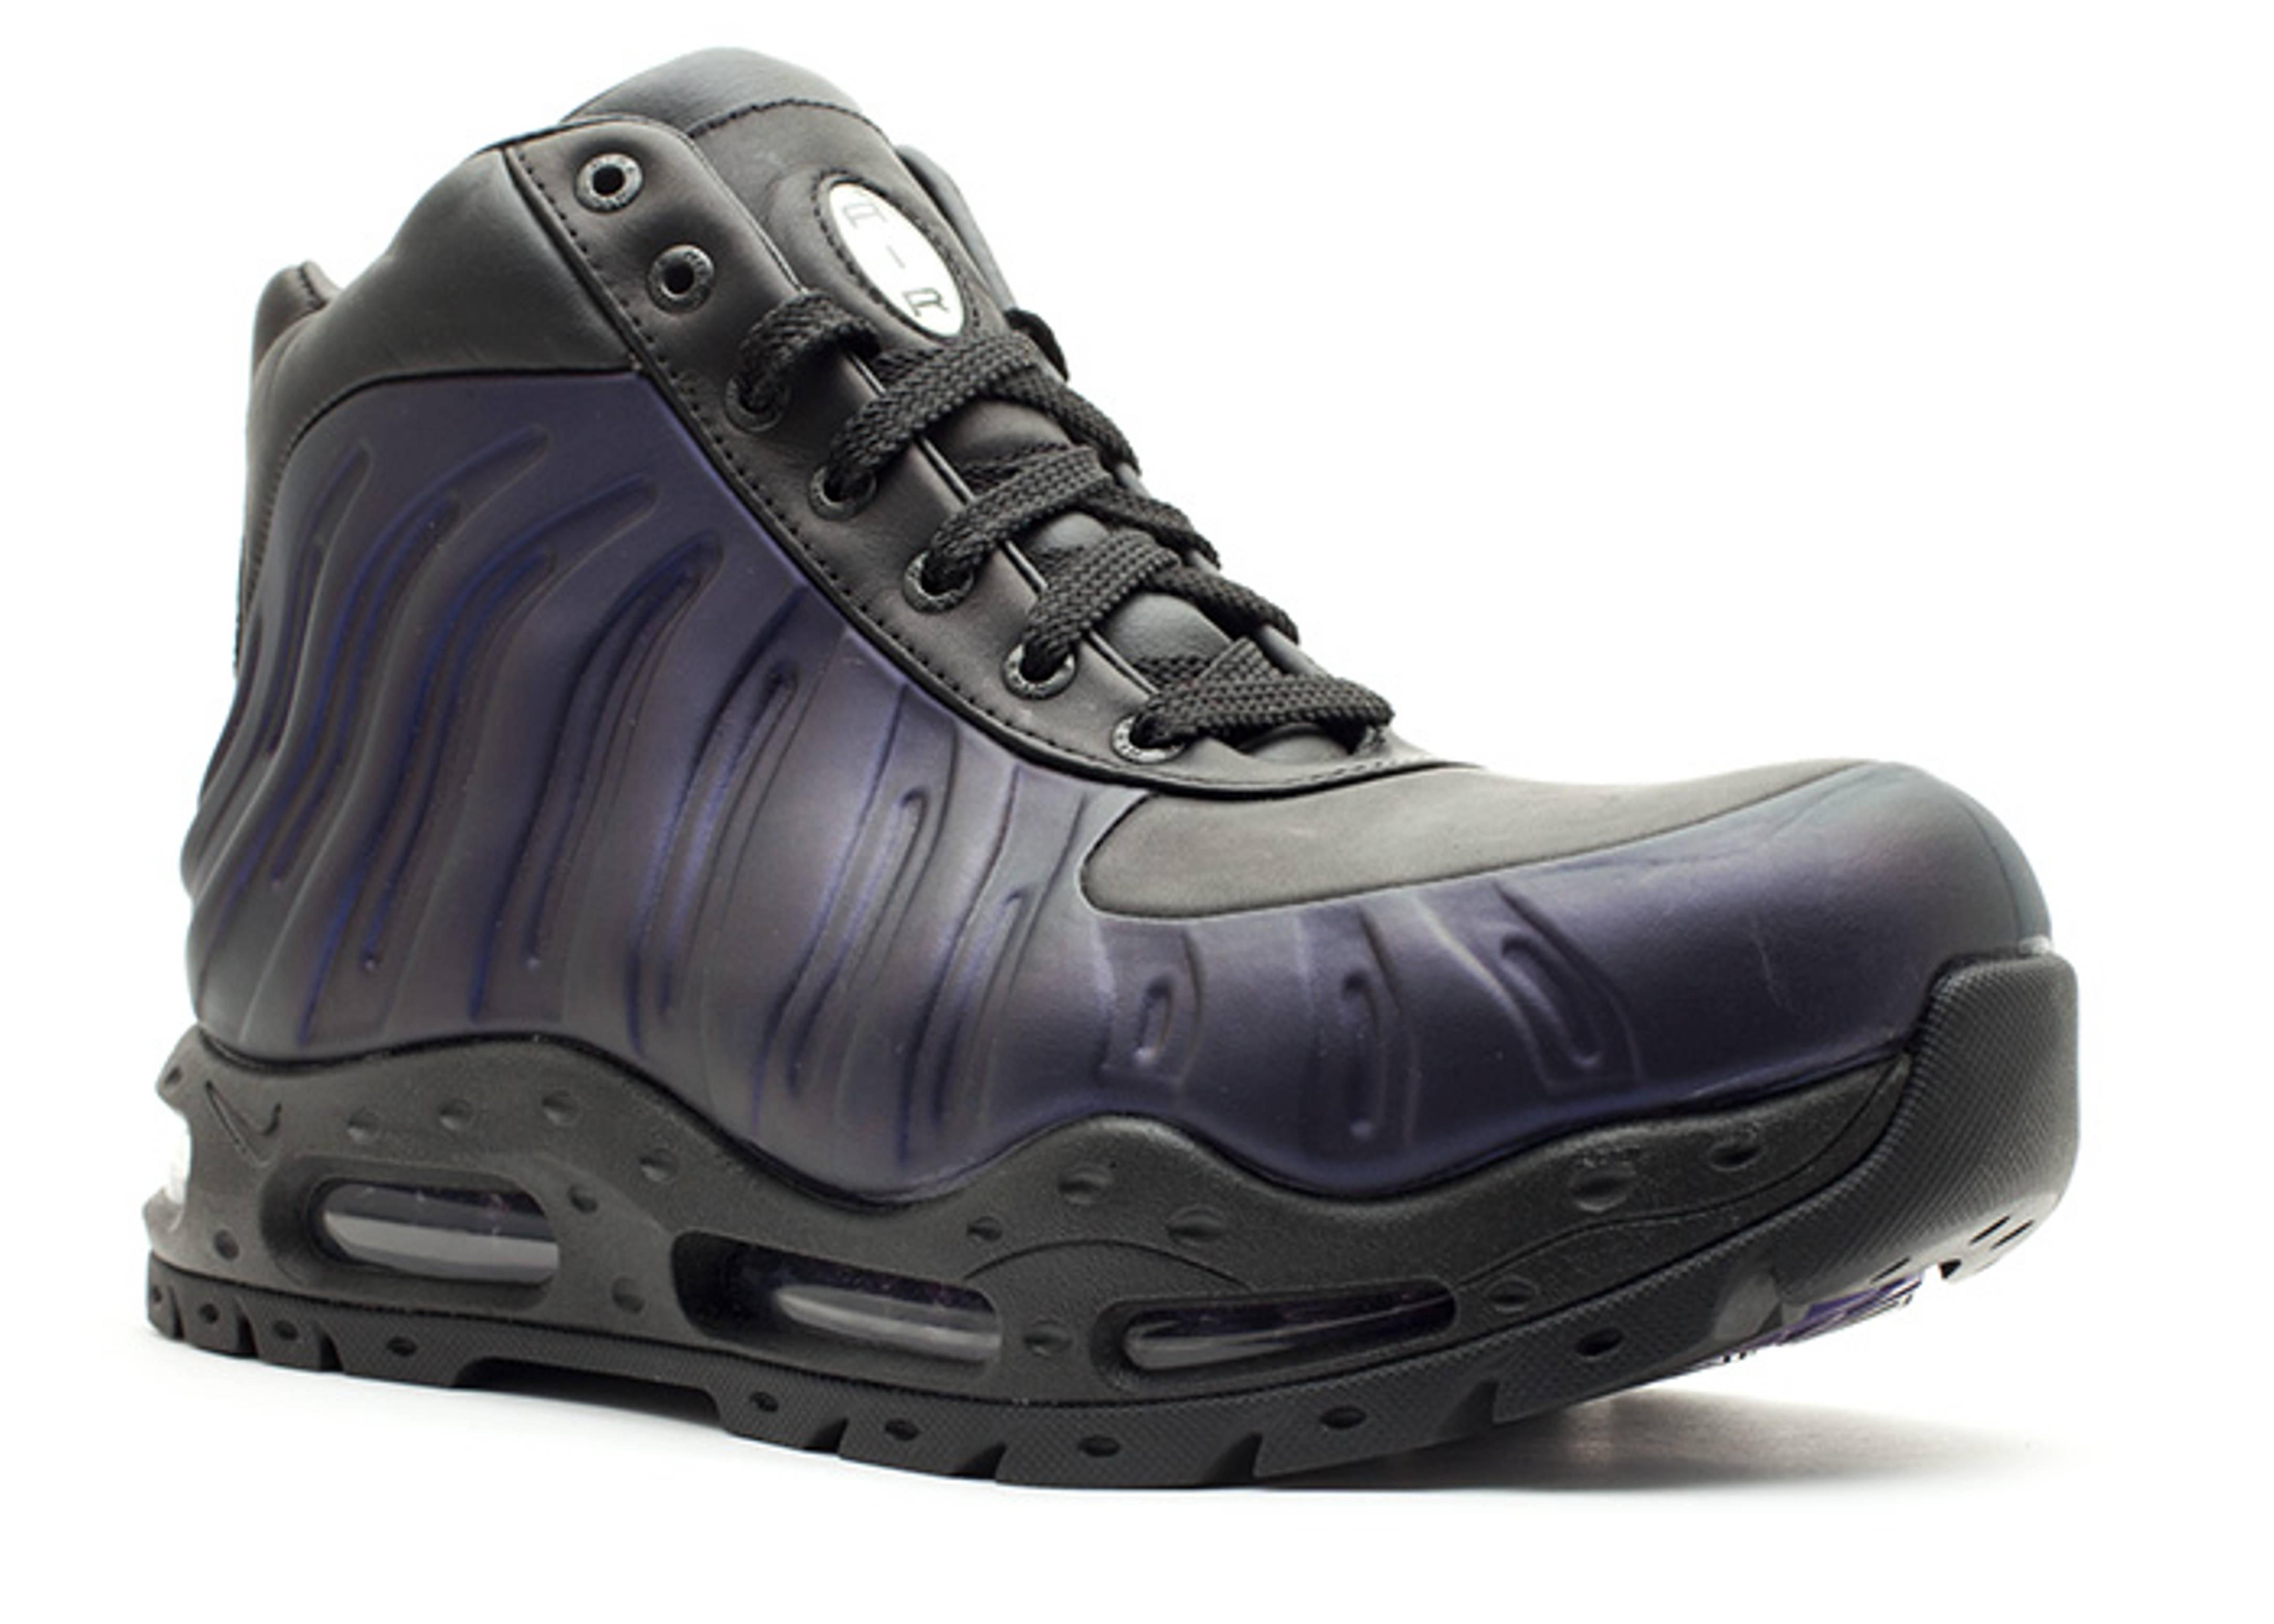 bcd968e041a5 Foamposite Boot - Nike - 333791 504 - black club purple